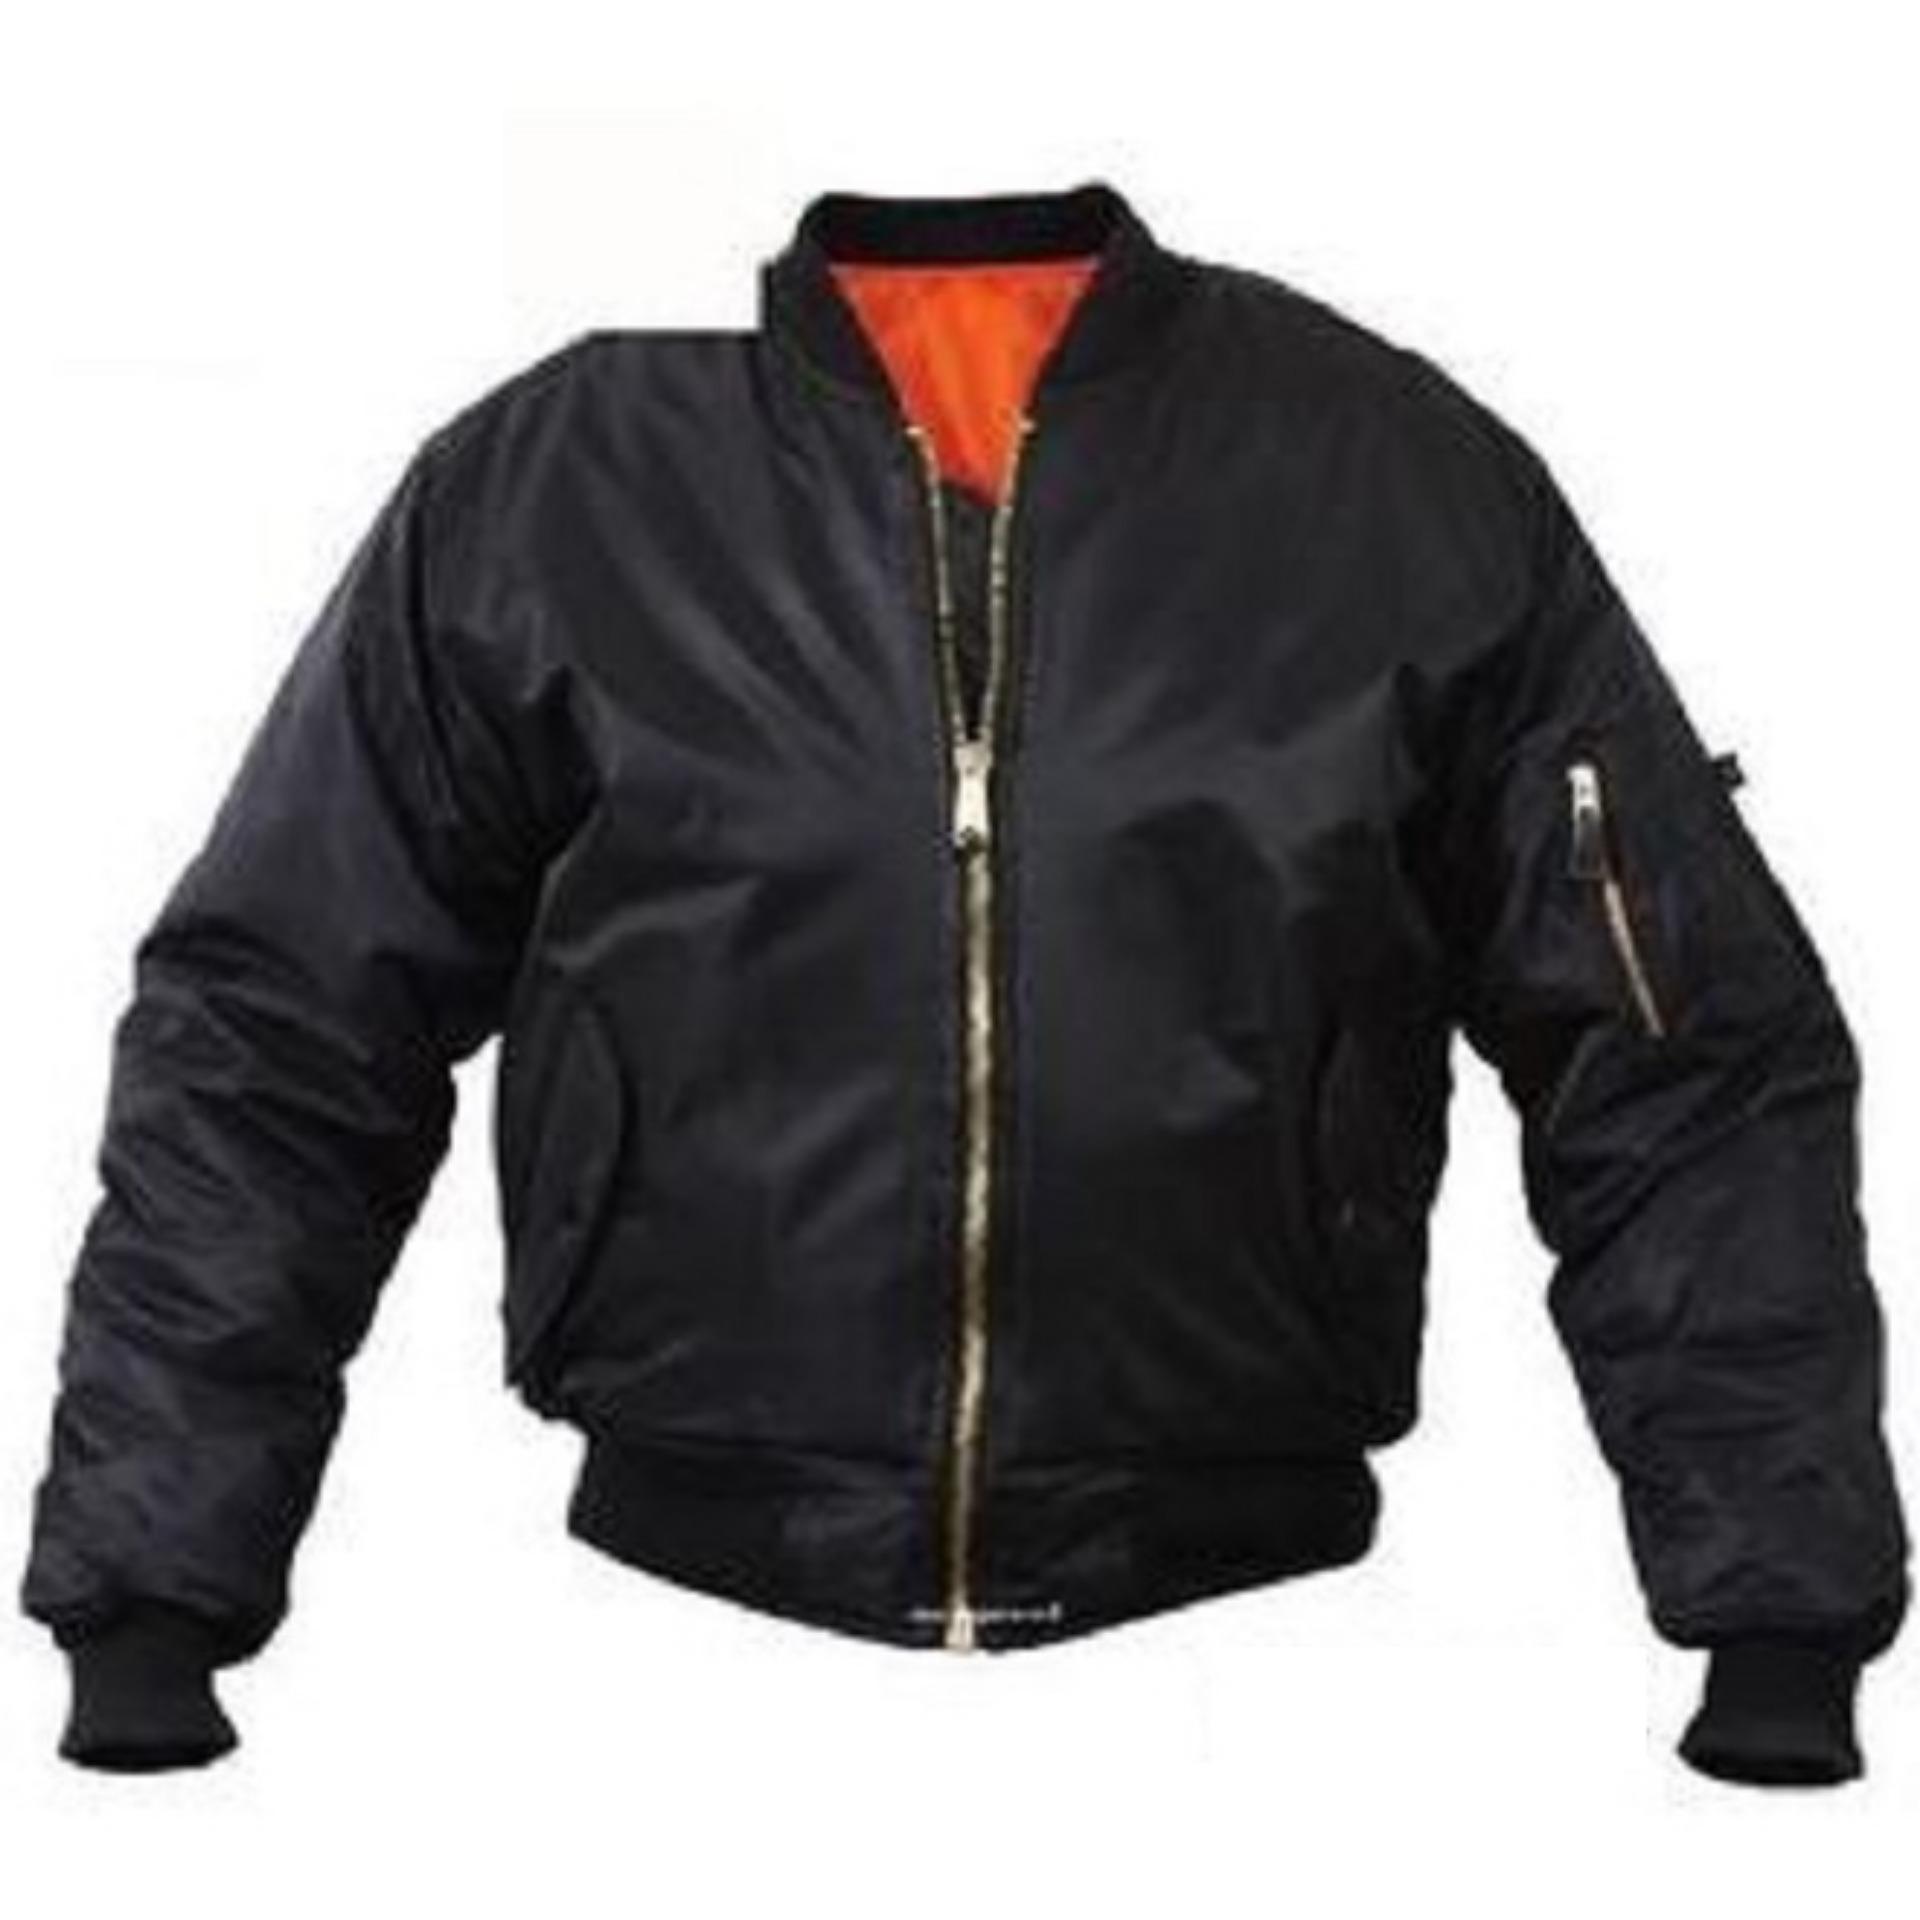 Jual Jaket Bomber Size All Size Premium Hitam Online